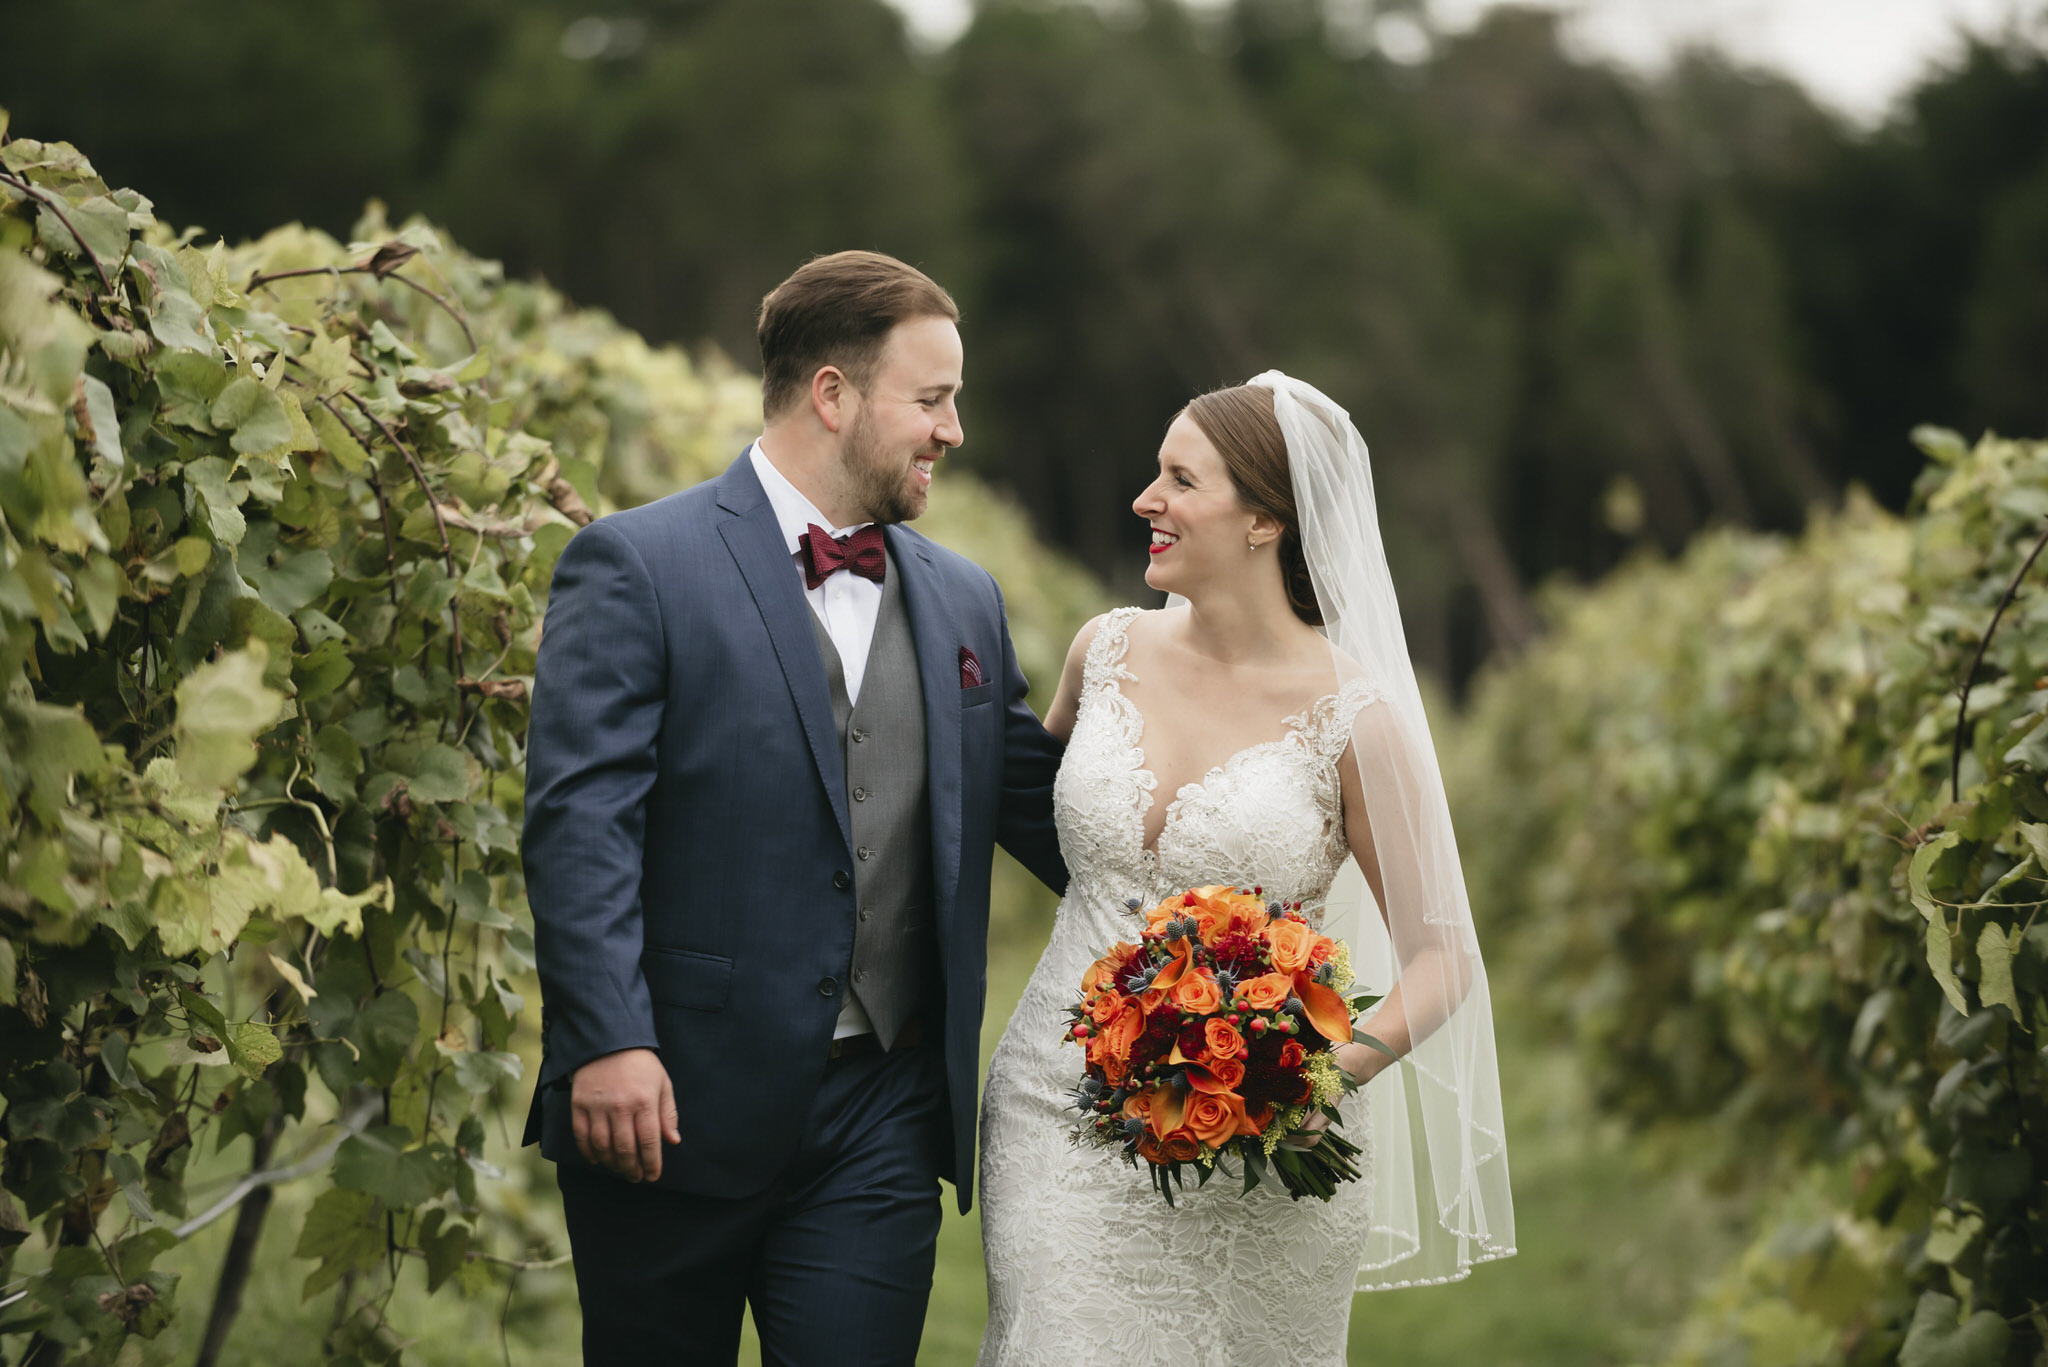 Bull Run Winery Wedding Photos-DSC_4479-1 copy.jpg